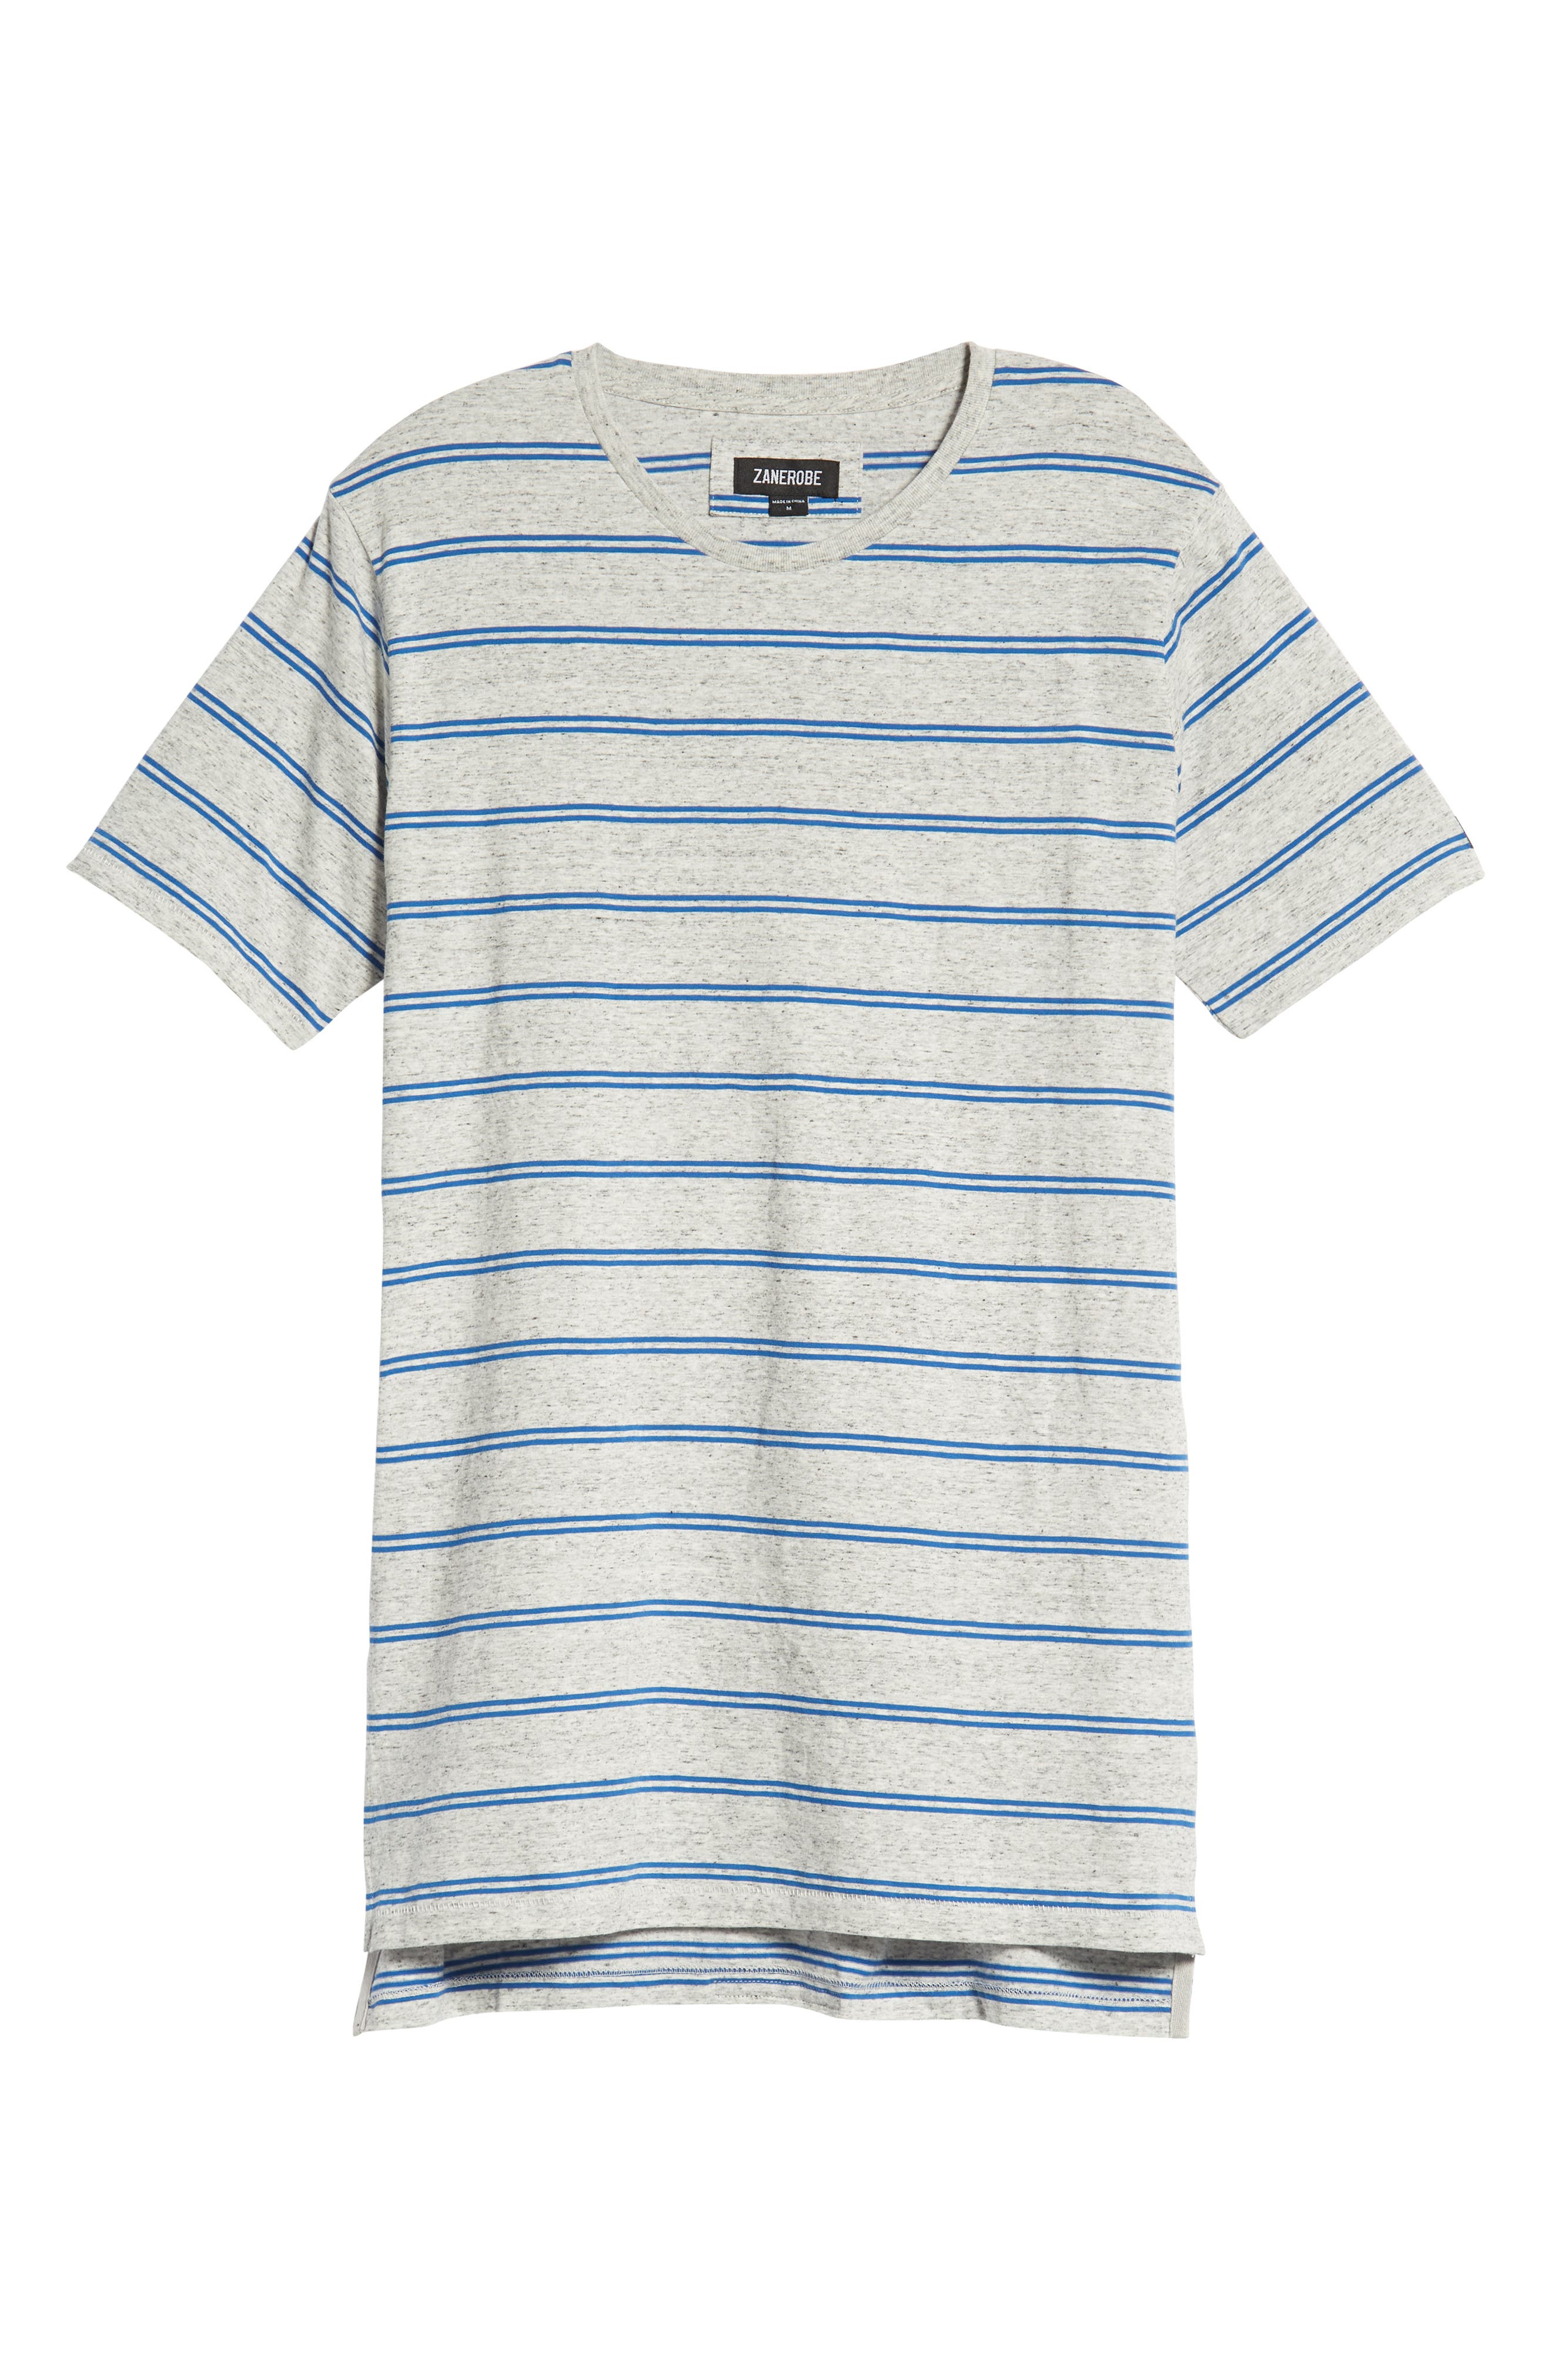 Flintlock T-Shirt,                             Alternate thumbnail 6, color,                             STORM MARLE/ COBALT